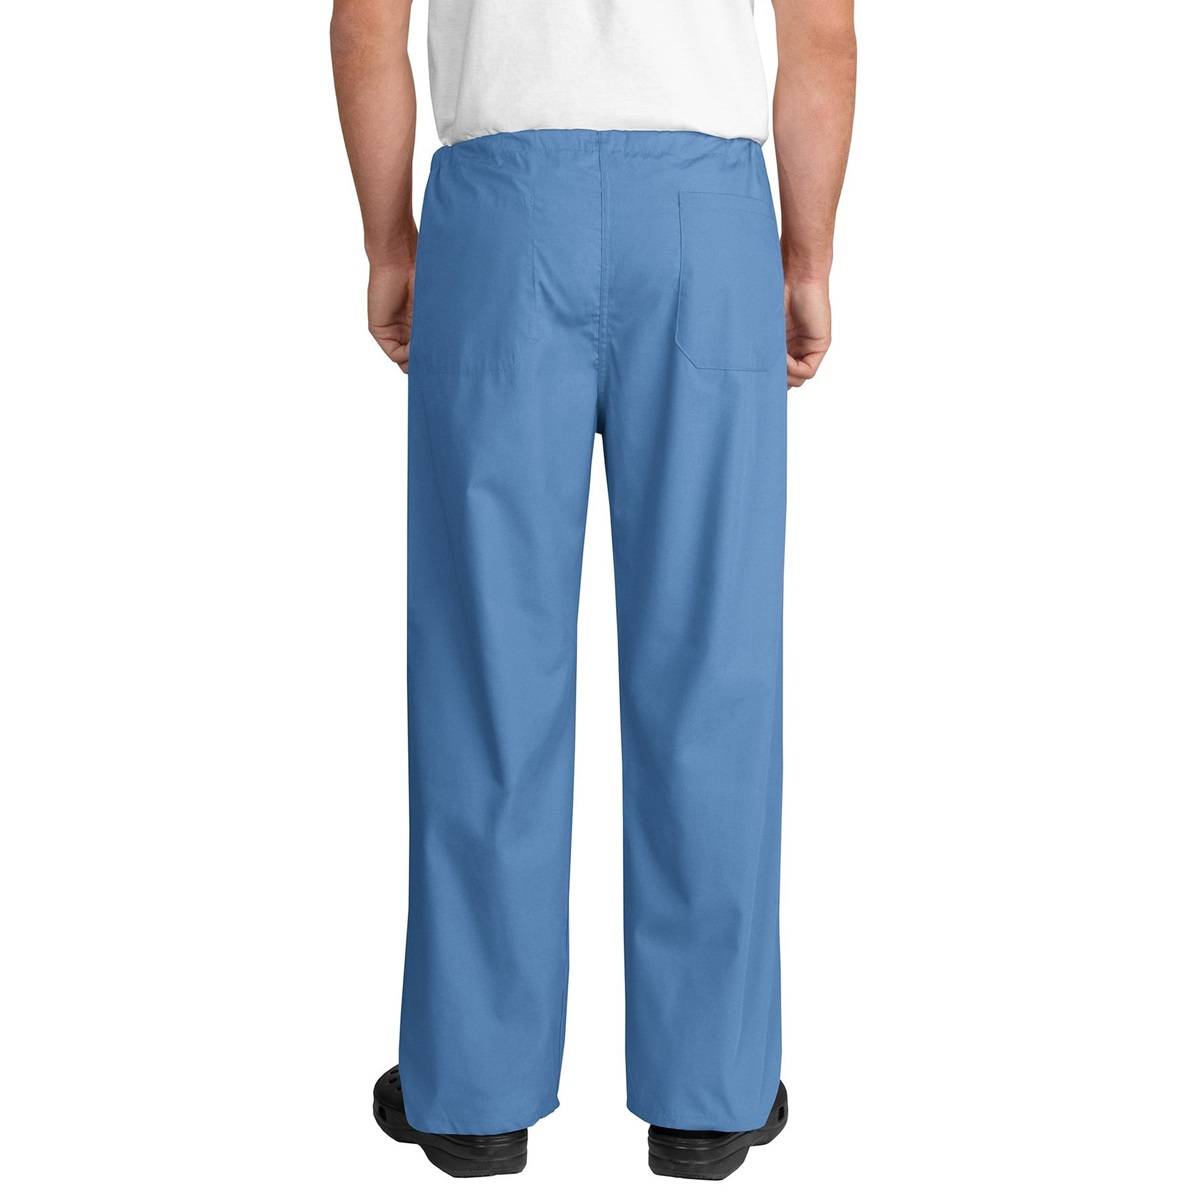 Cornerstone Cs502 Reversible Scrub Pants Ceil Blue